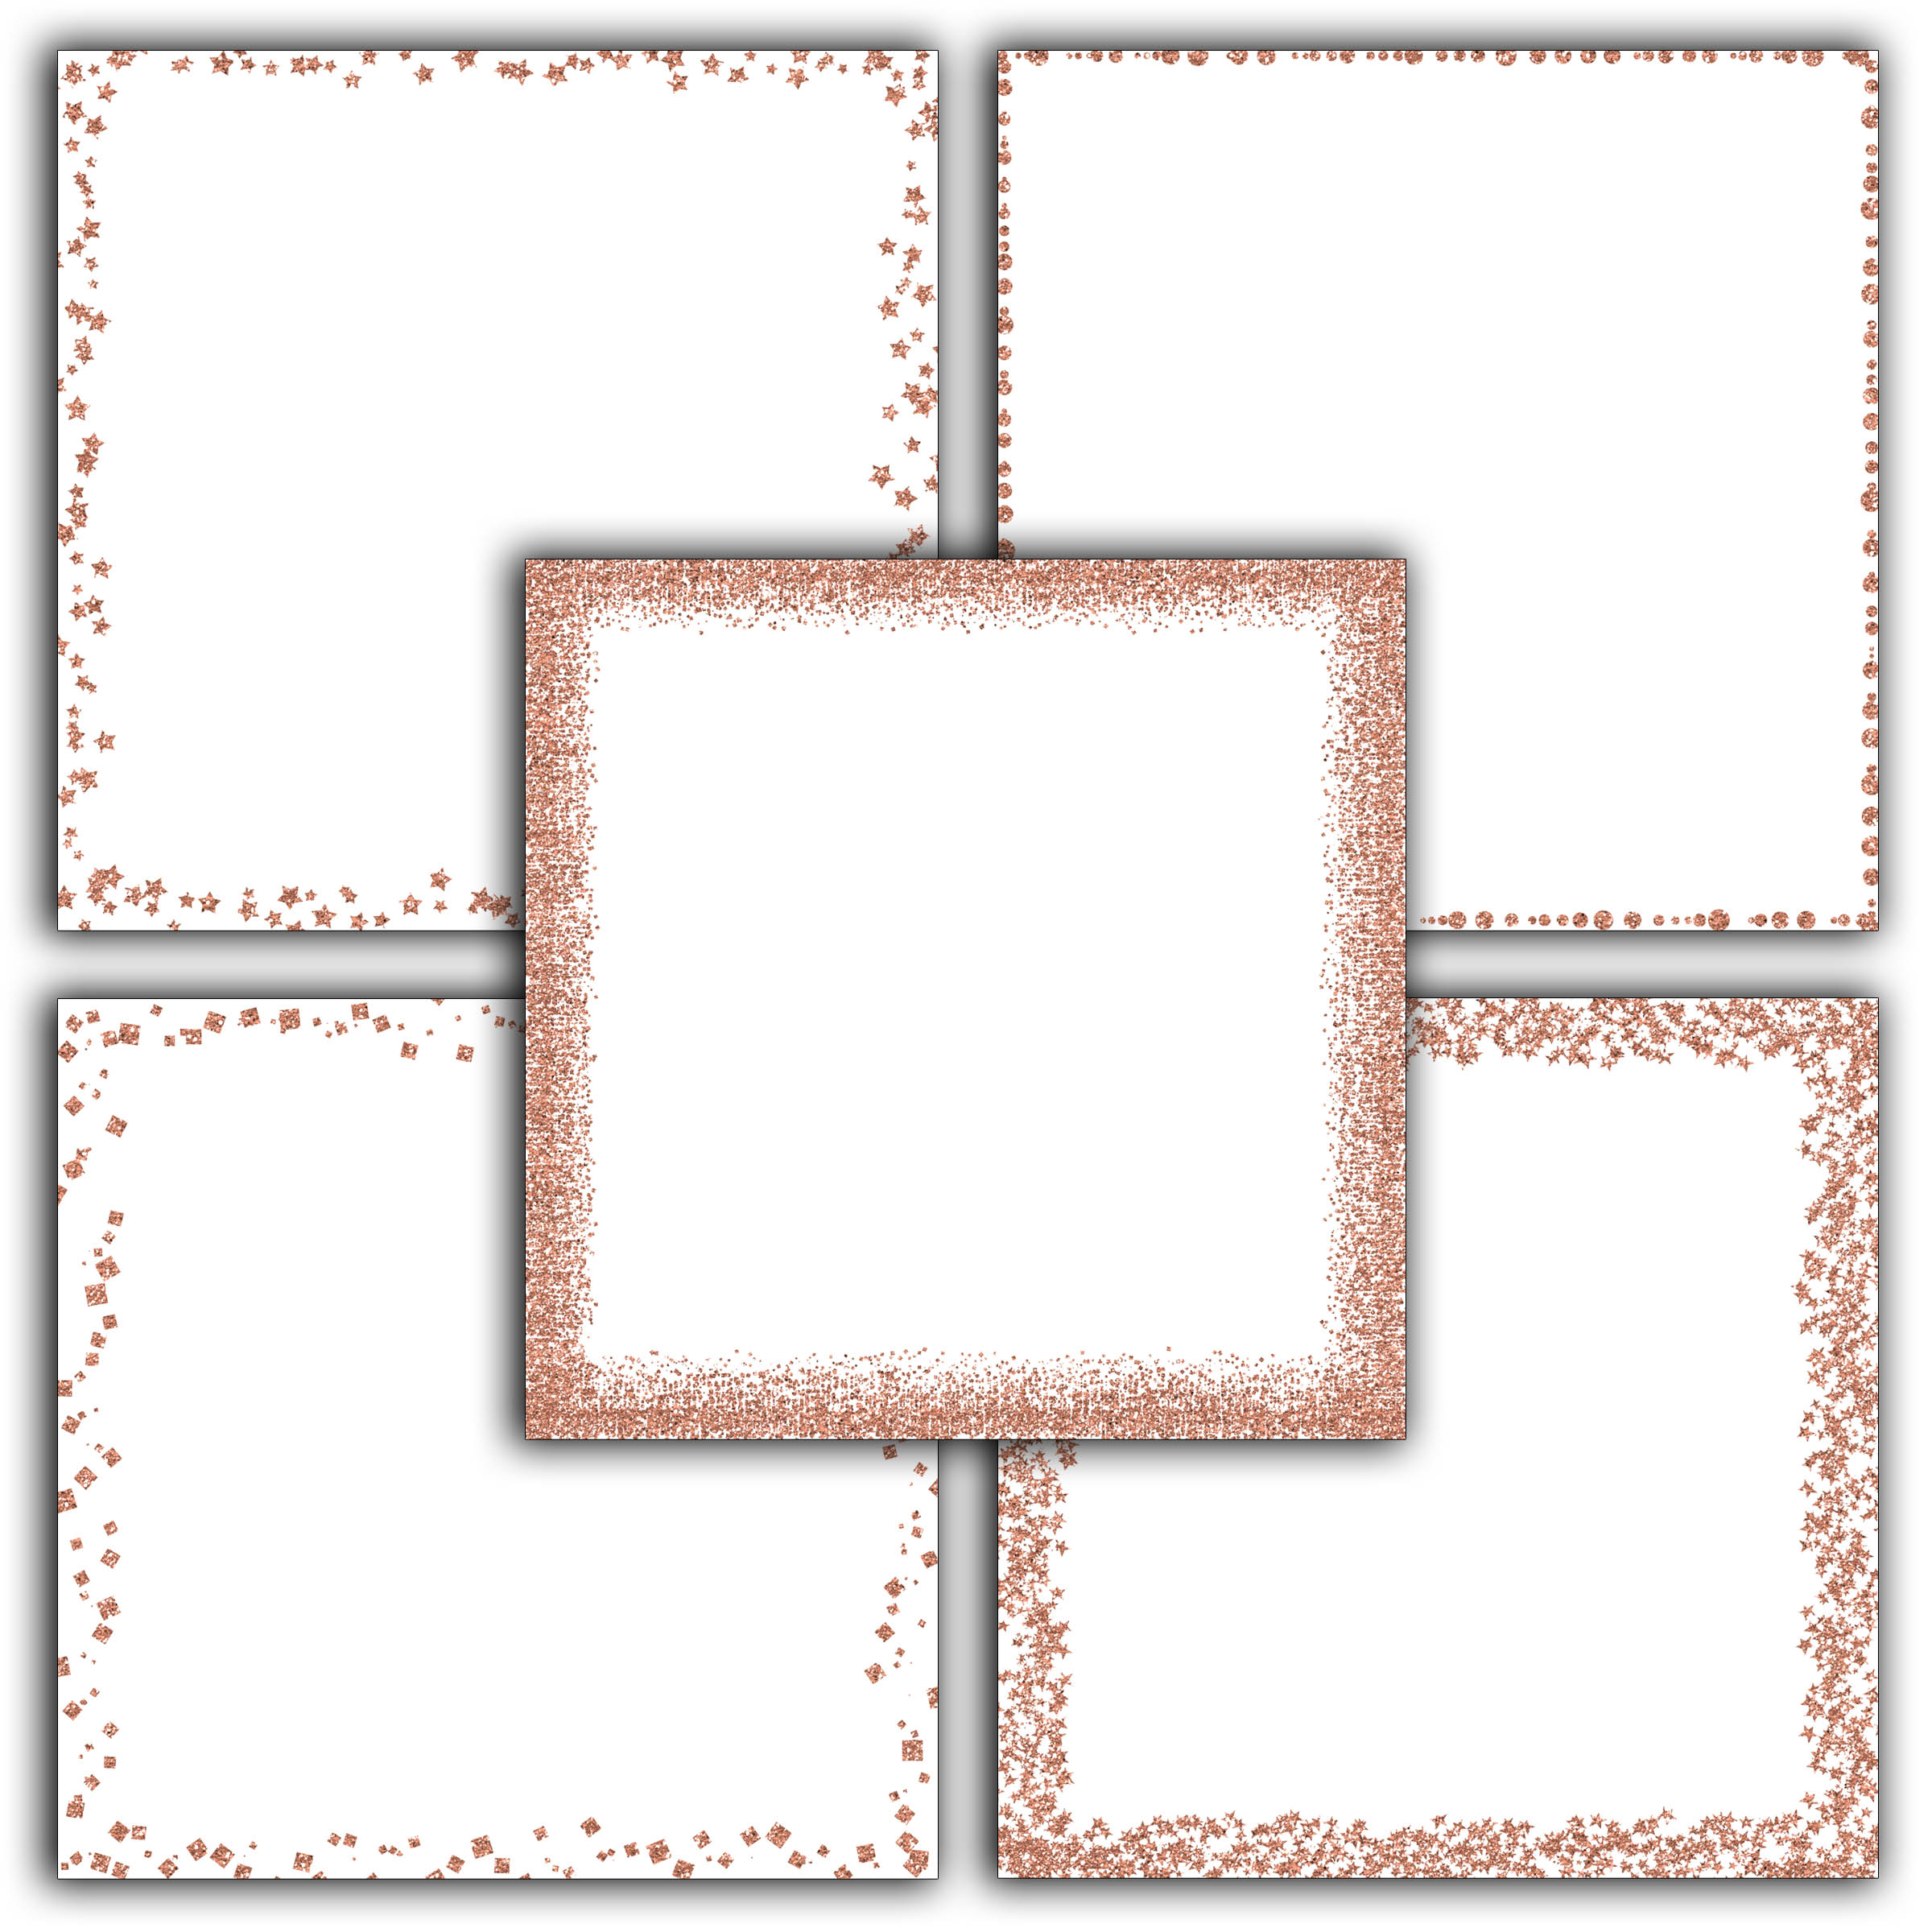 Rose Gold Glitter Borders Digital Paper example image 2